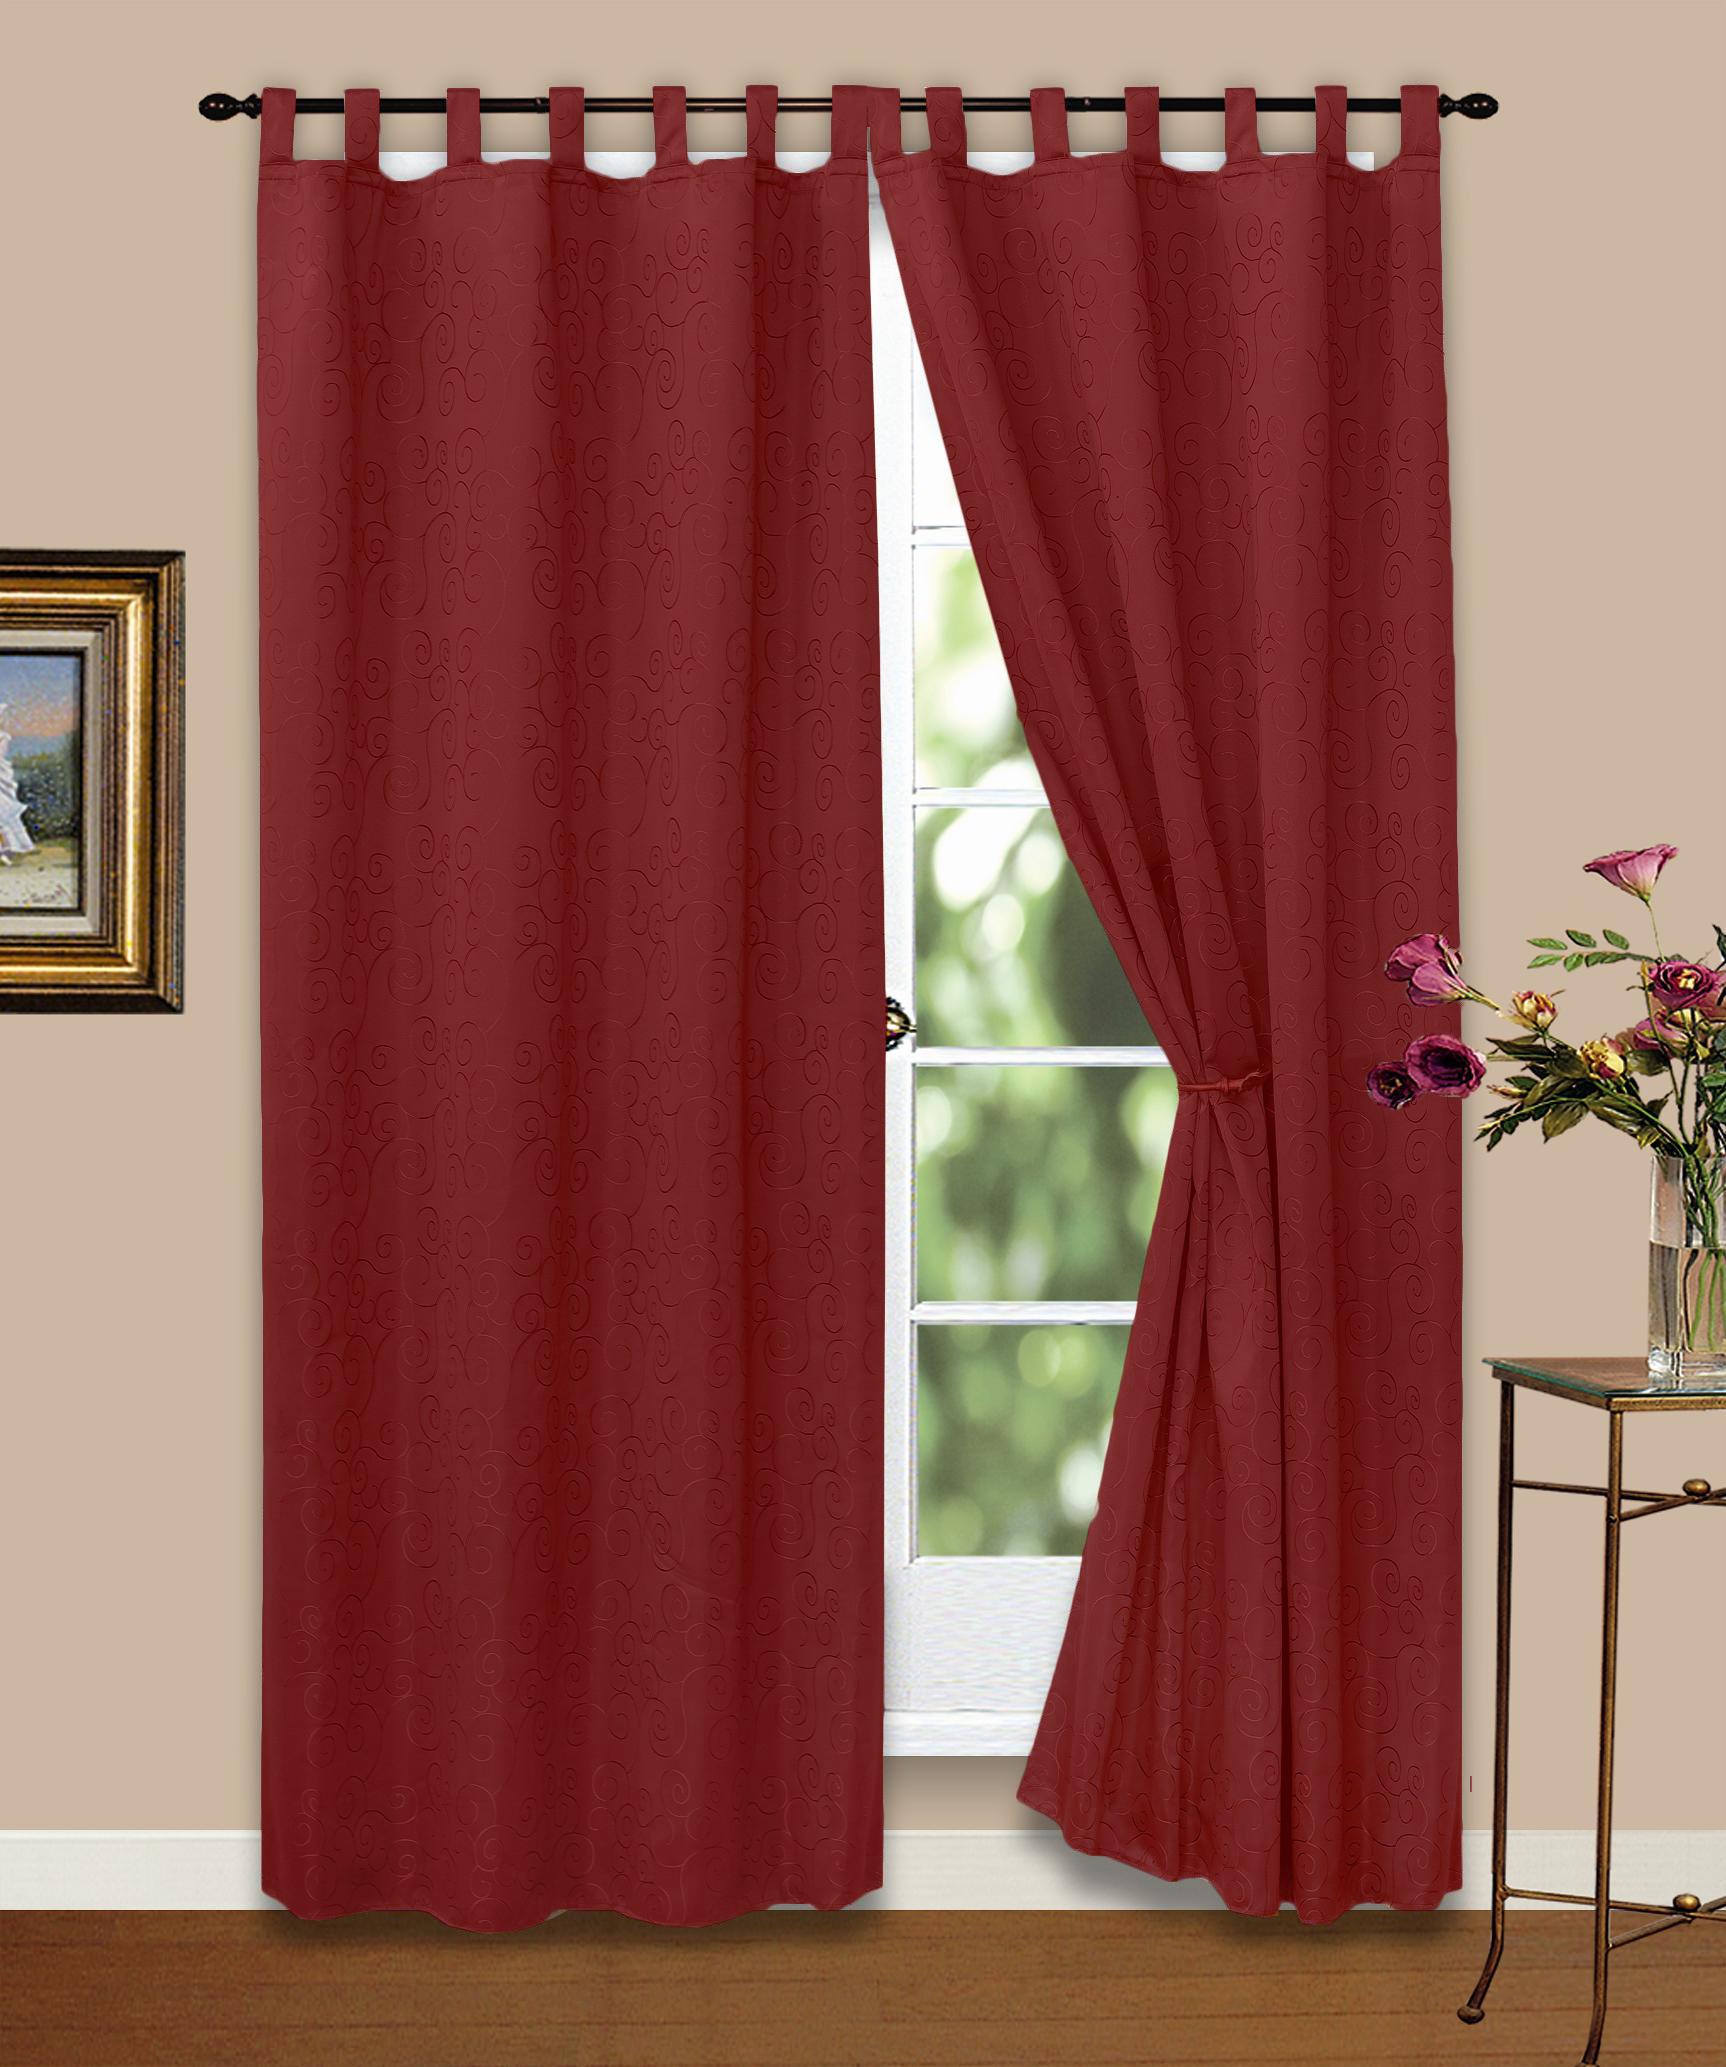 vorhang gardine blickdicht ornamente wein rot 140x245 cm. Black Bedroom Furniture Sets. Home Design Ideas